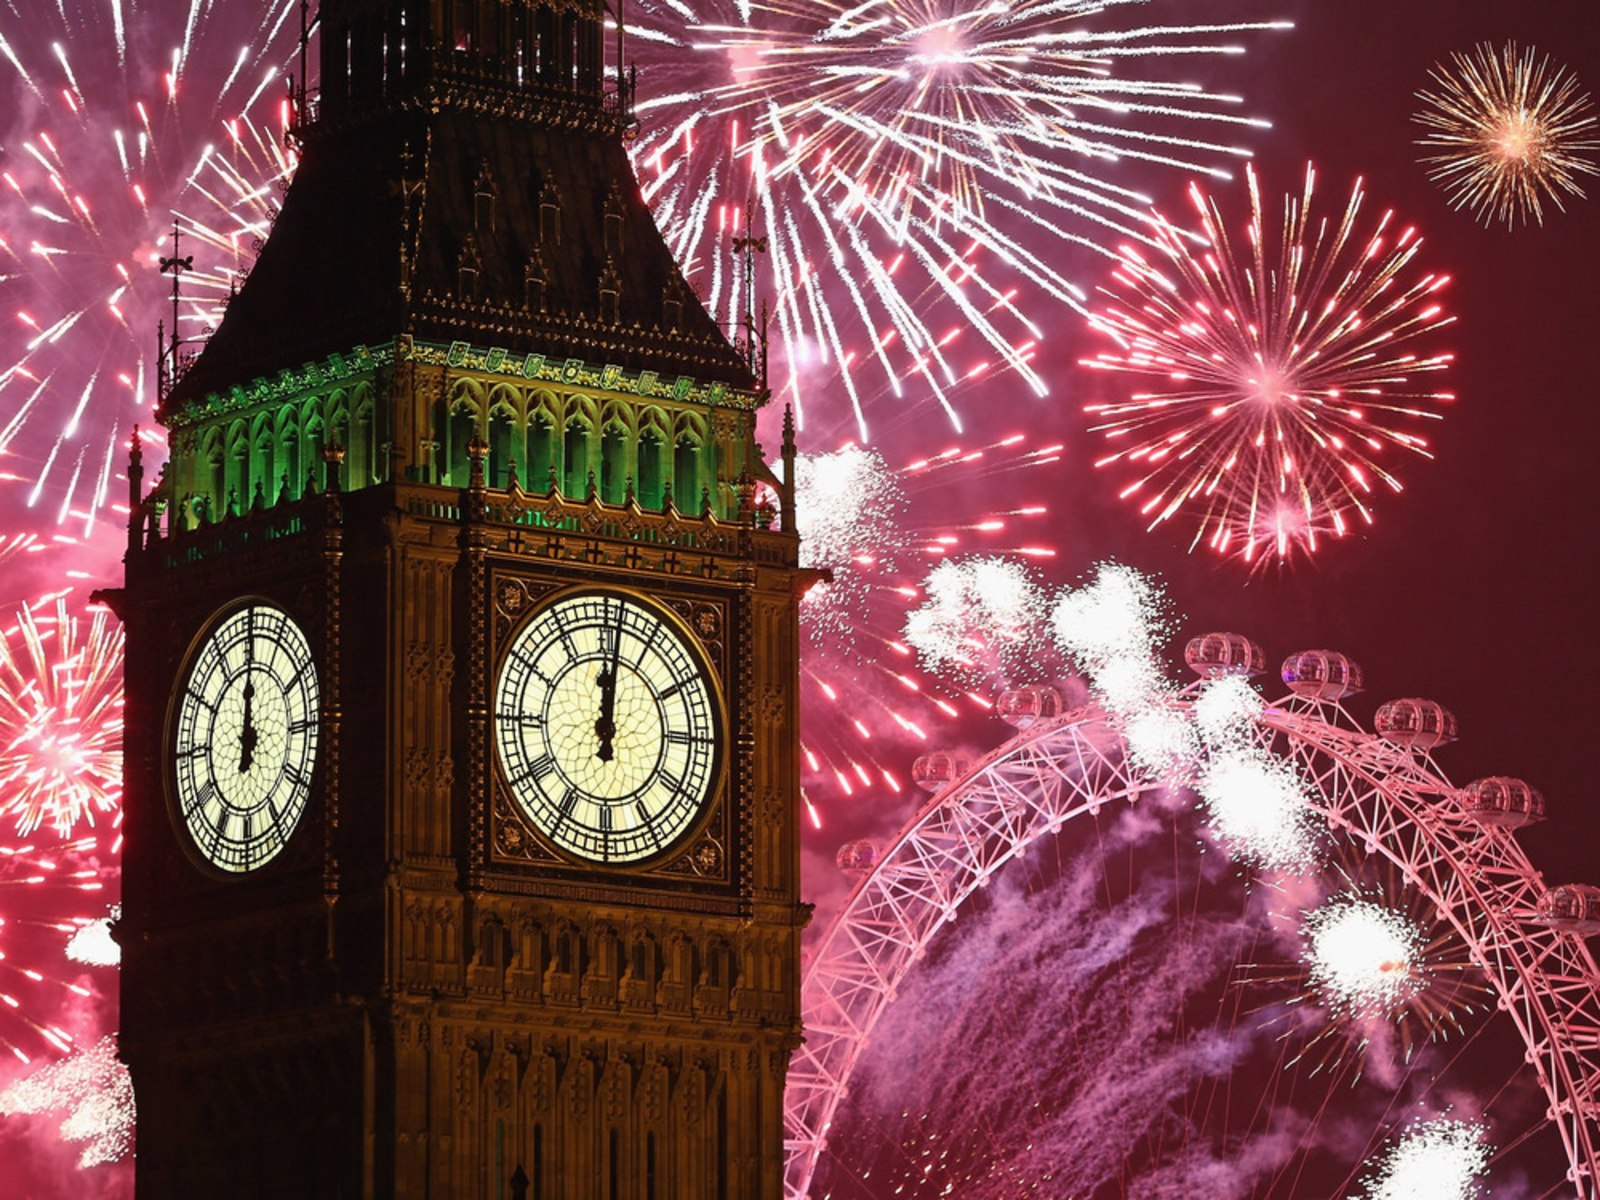 Image: Fireworks light up the London skyline and Big Ben.